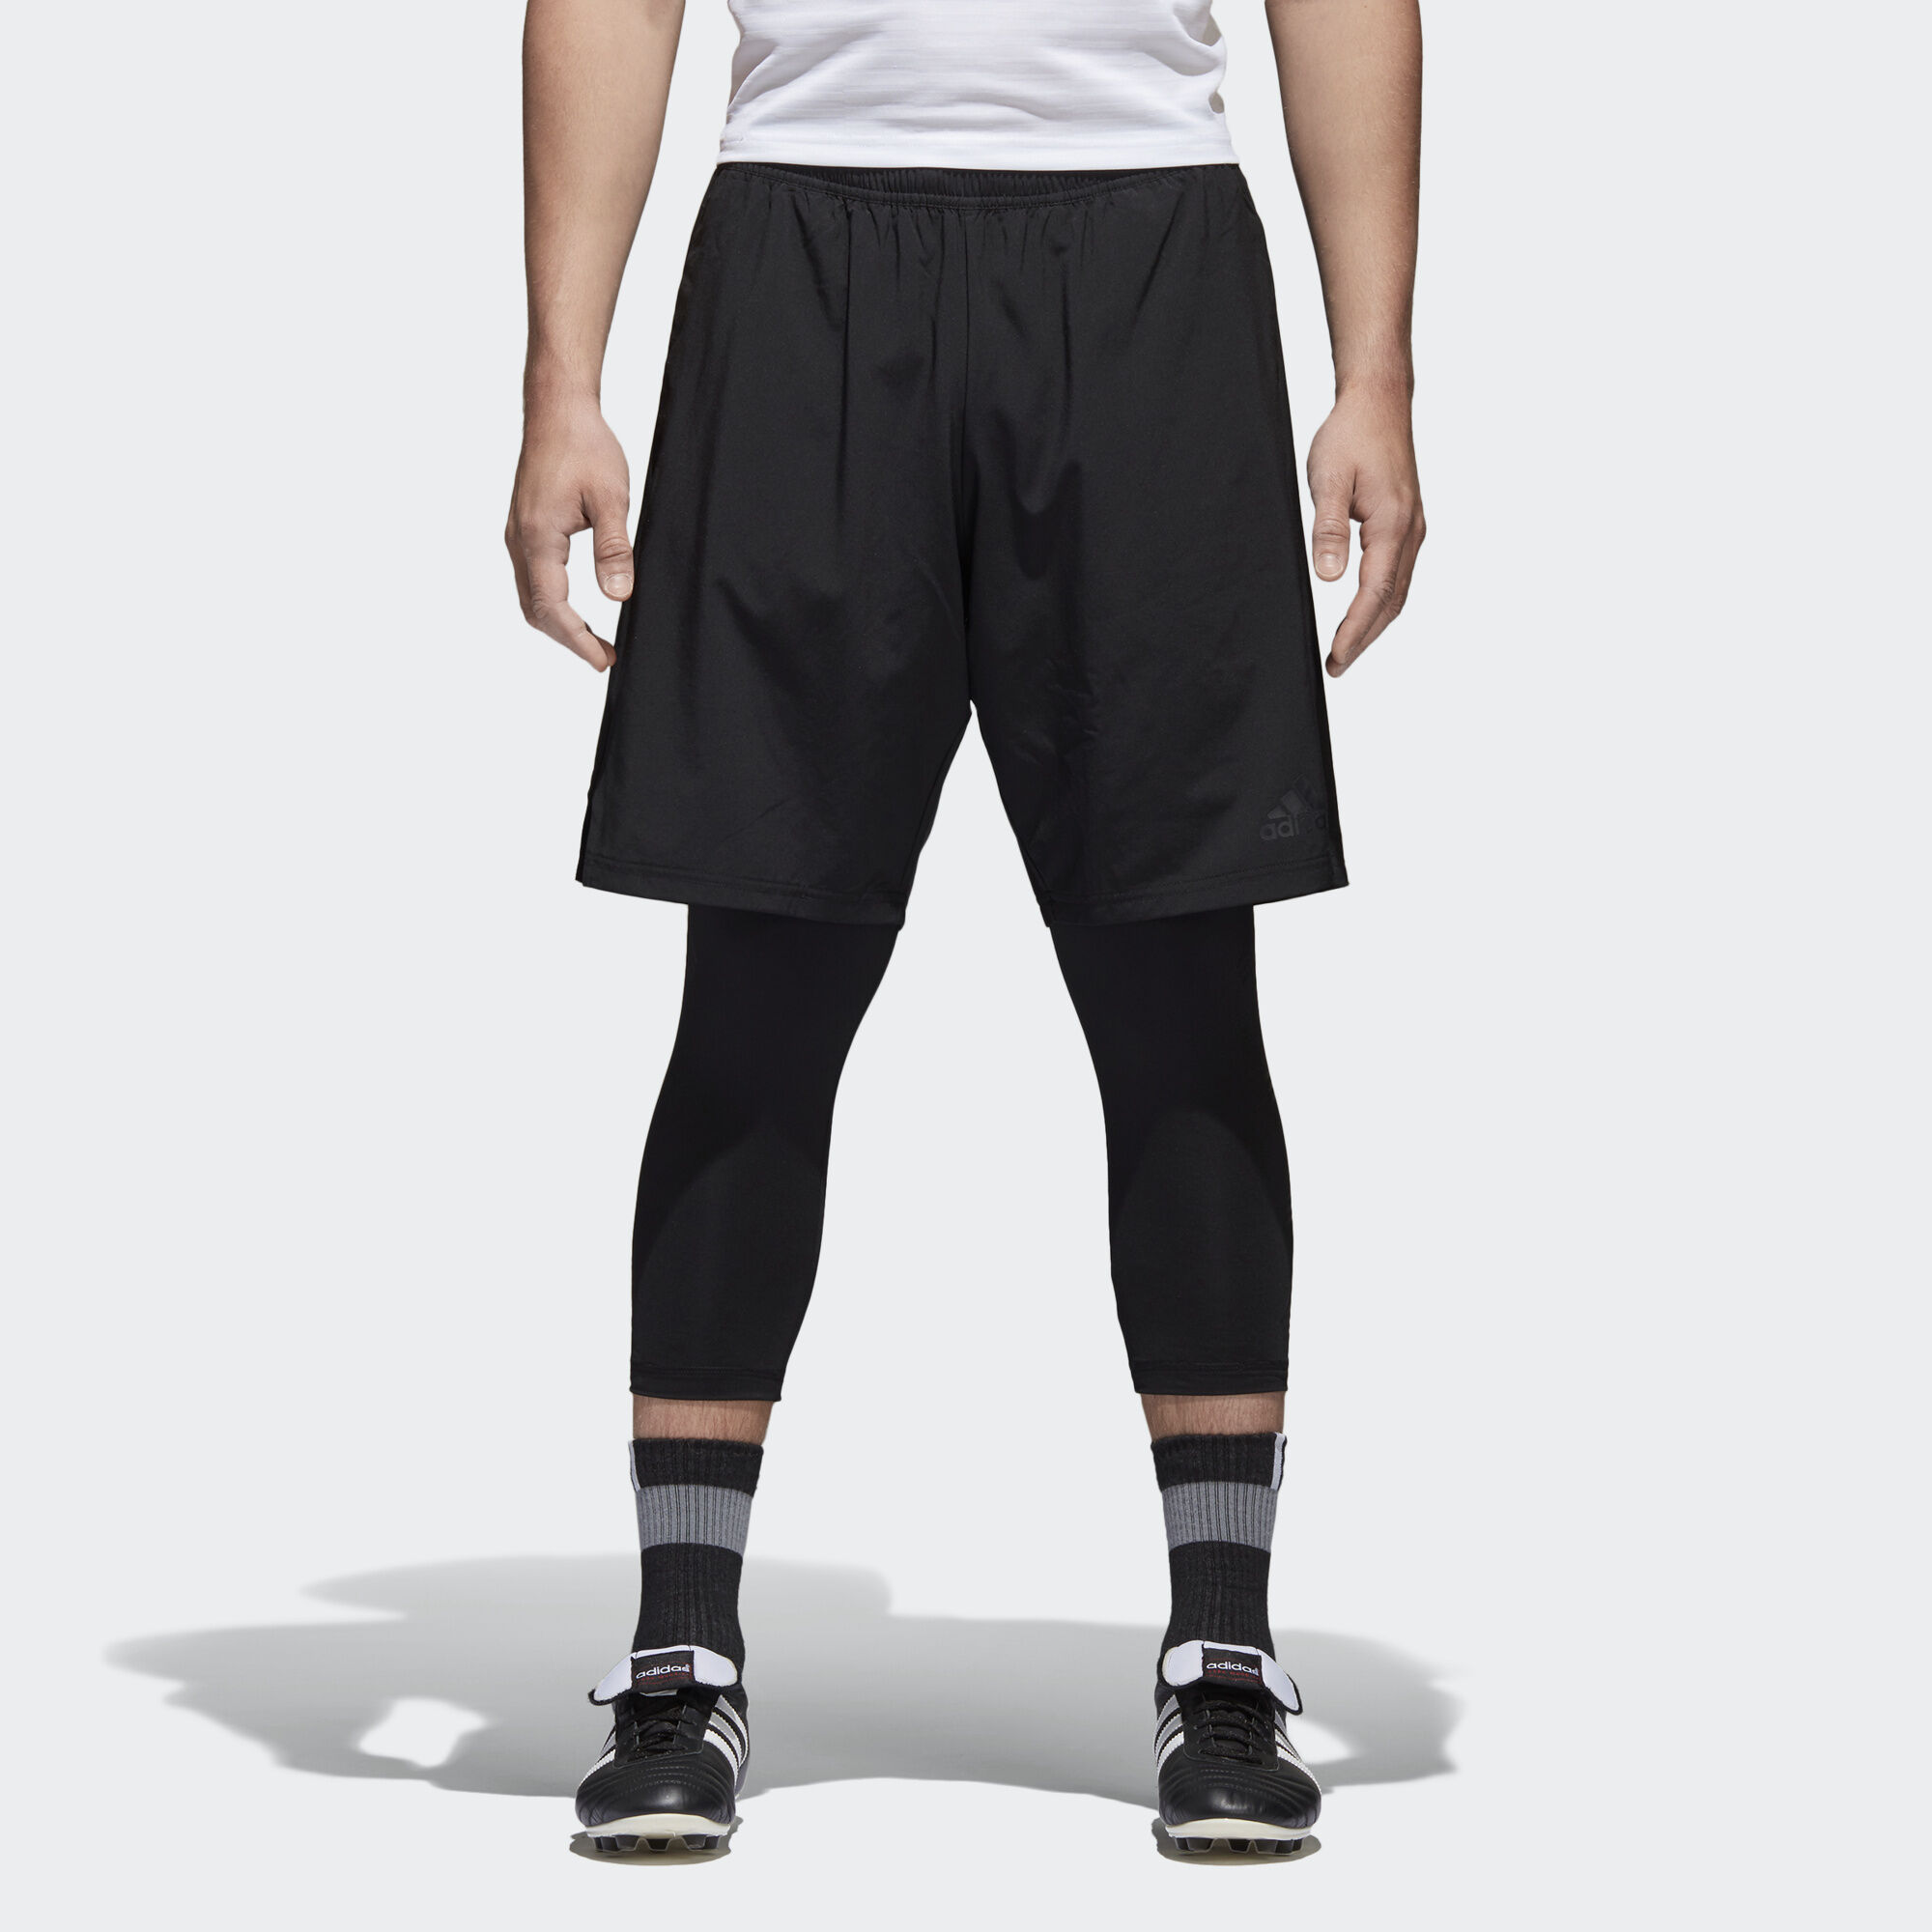 Adidas Y Black Regional Mallas Corto Pantalón Tango pXnwxWBqT7